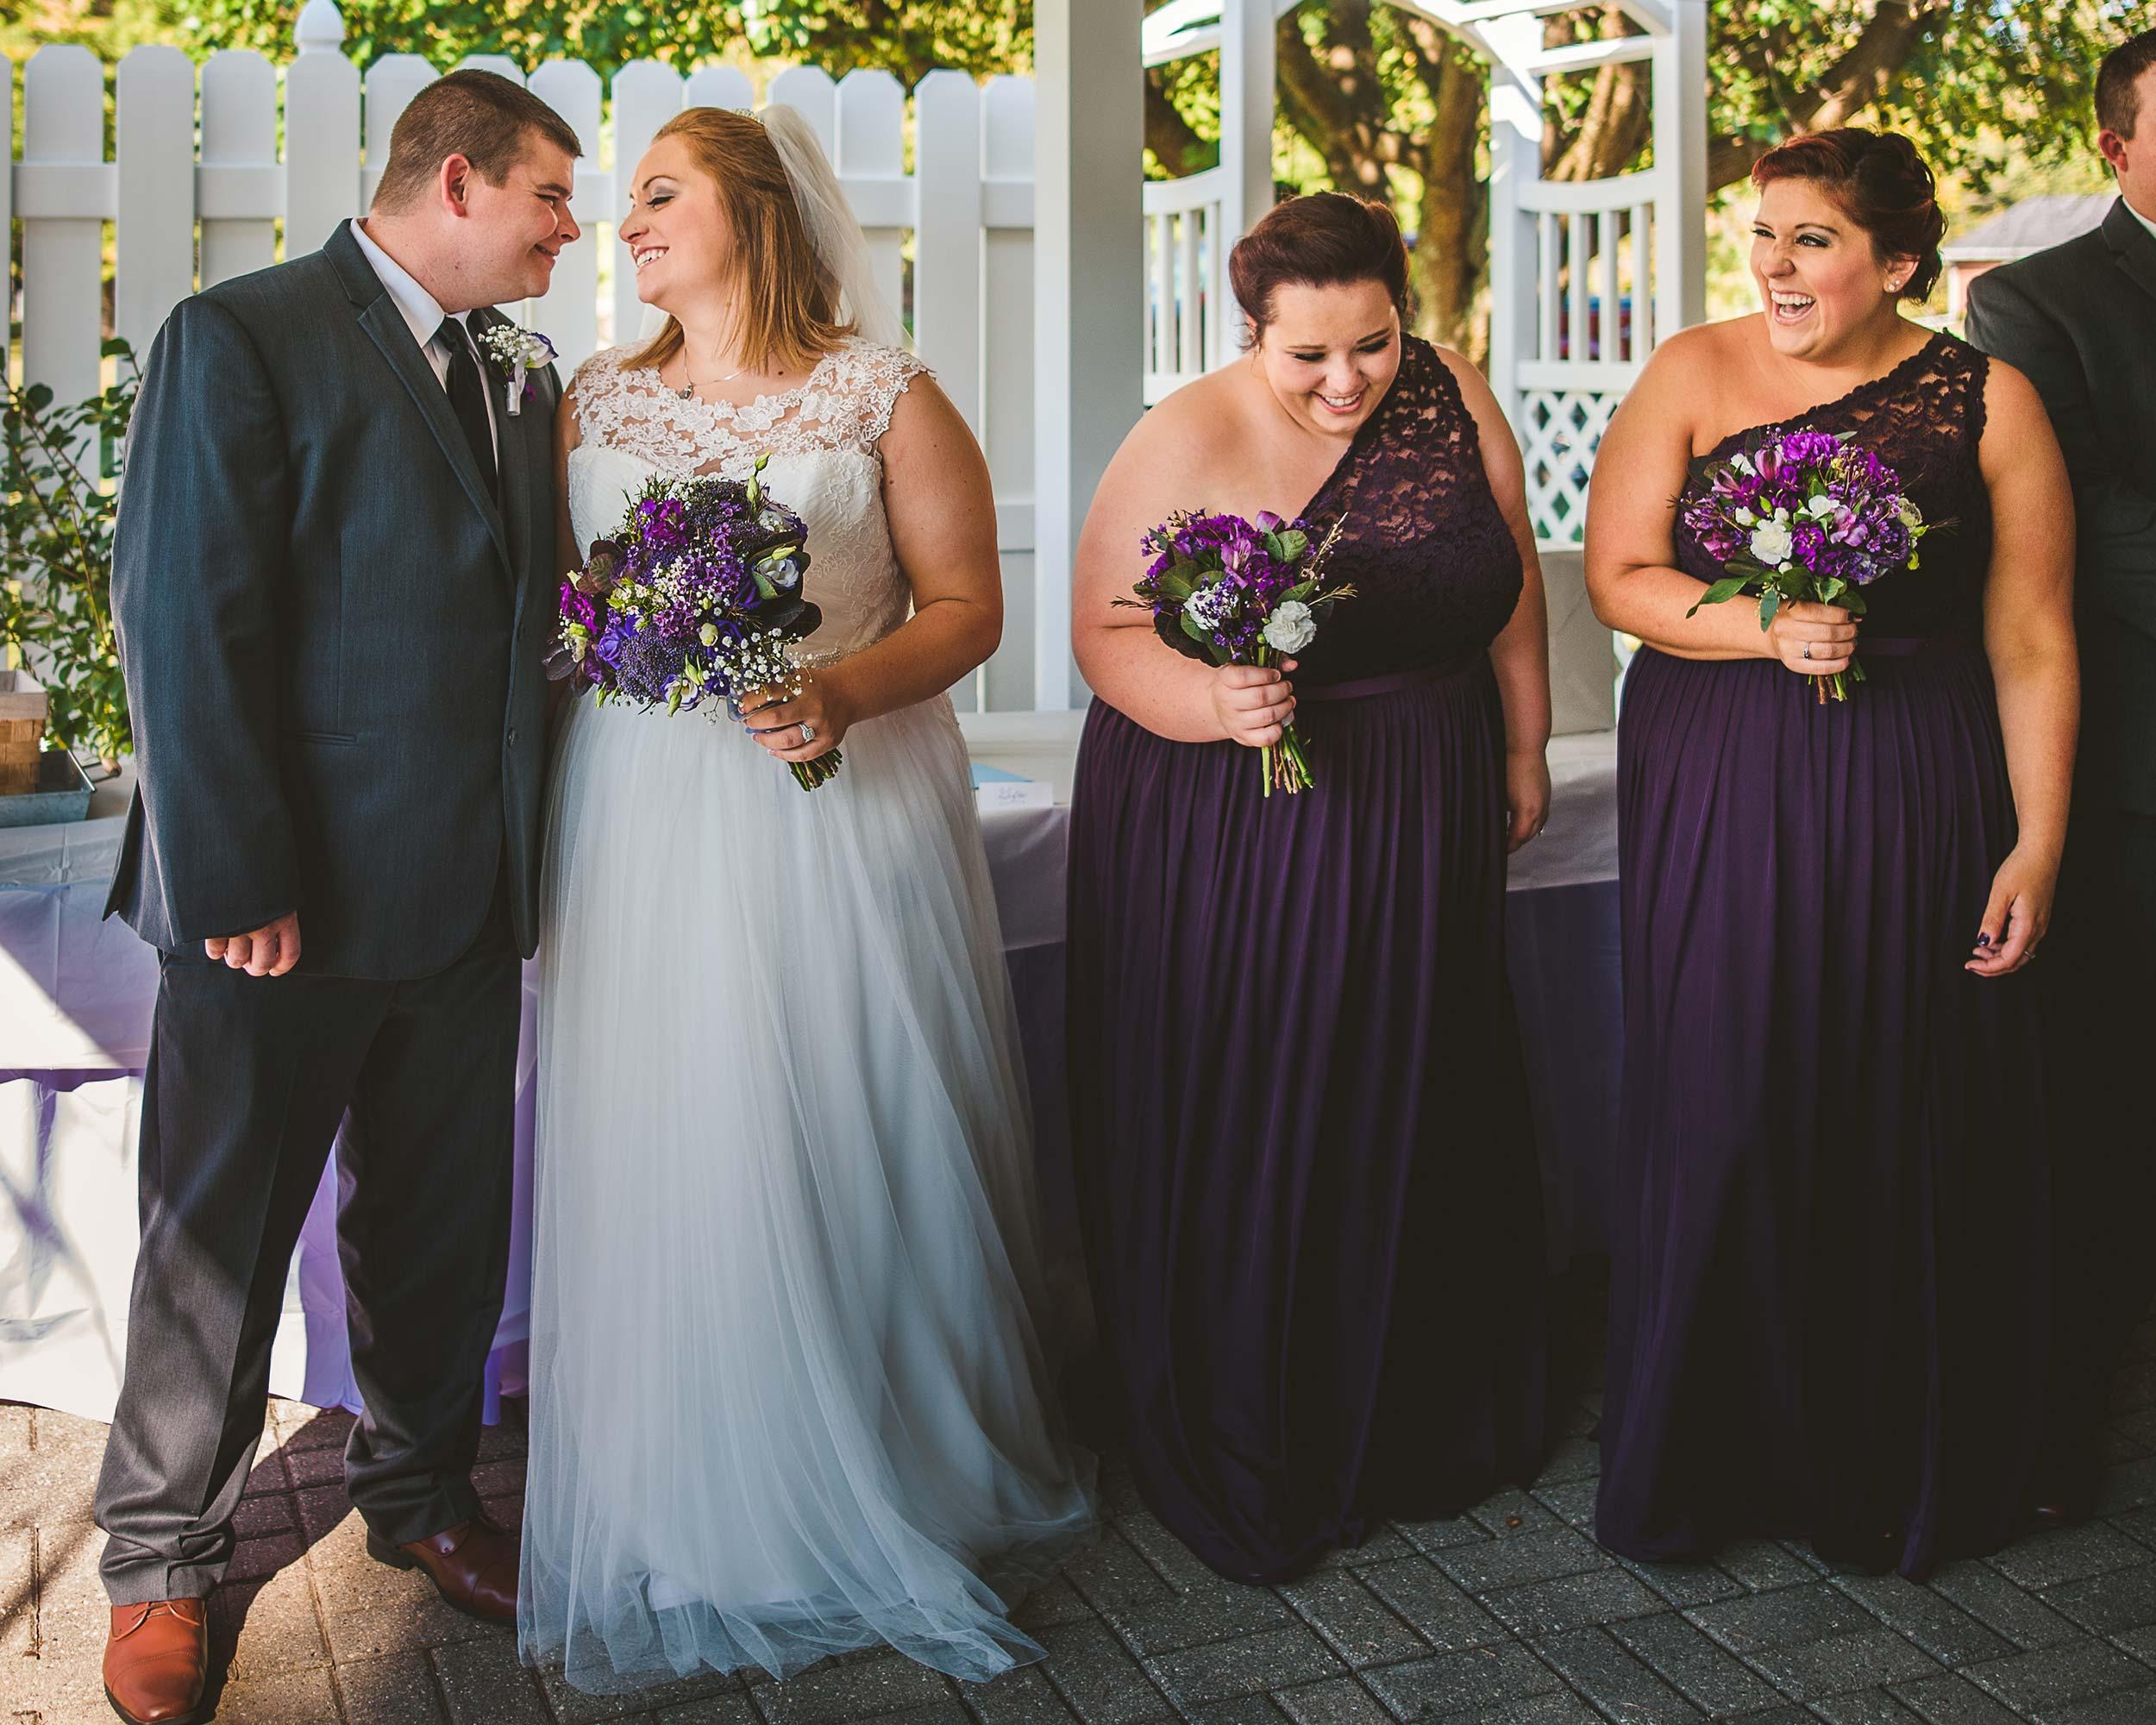 sweet-moment-post-wedding-ceremony-bride-groom.jpg